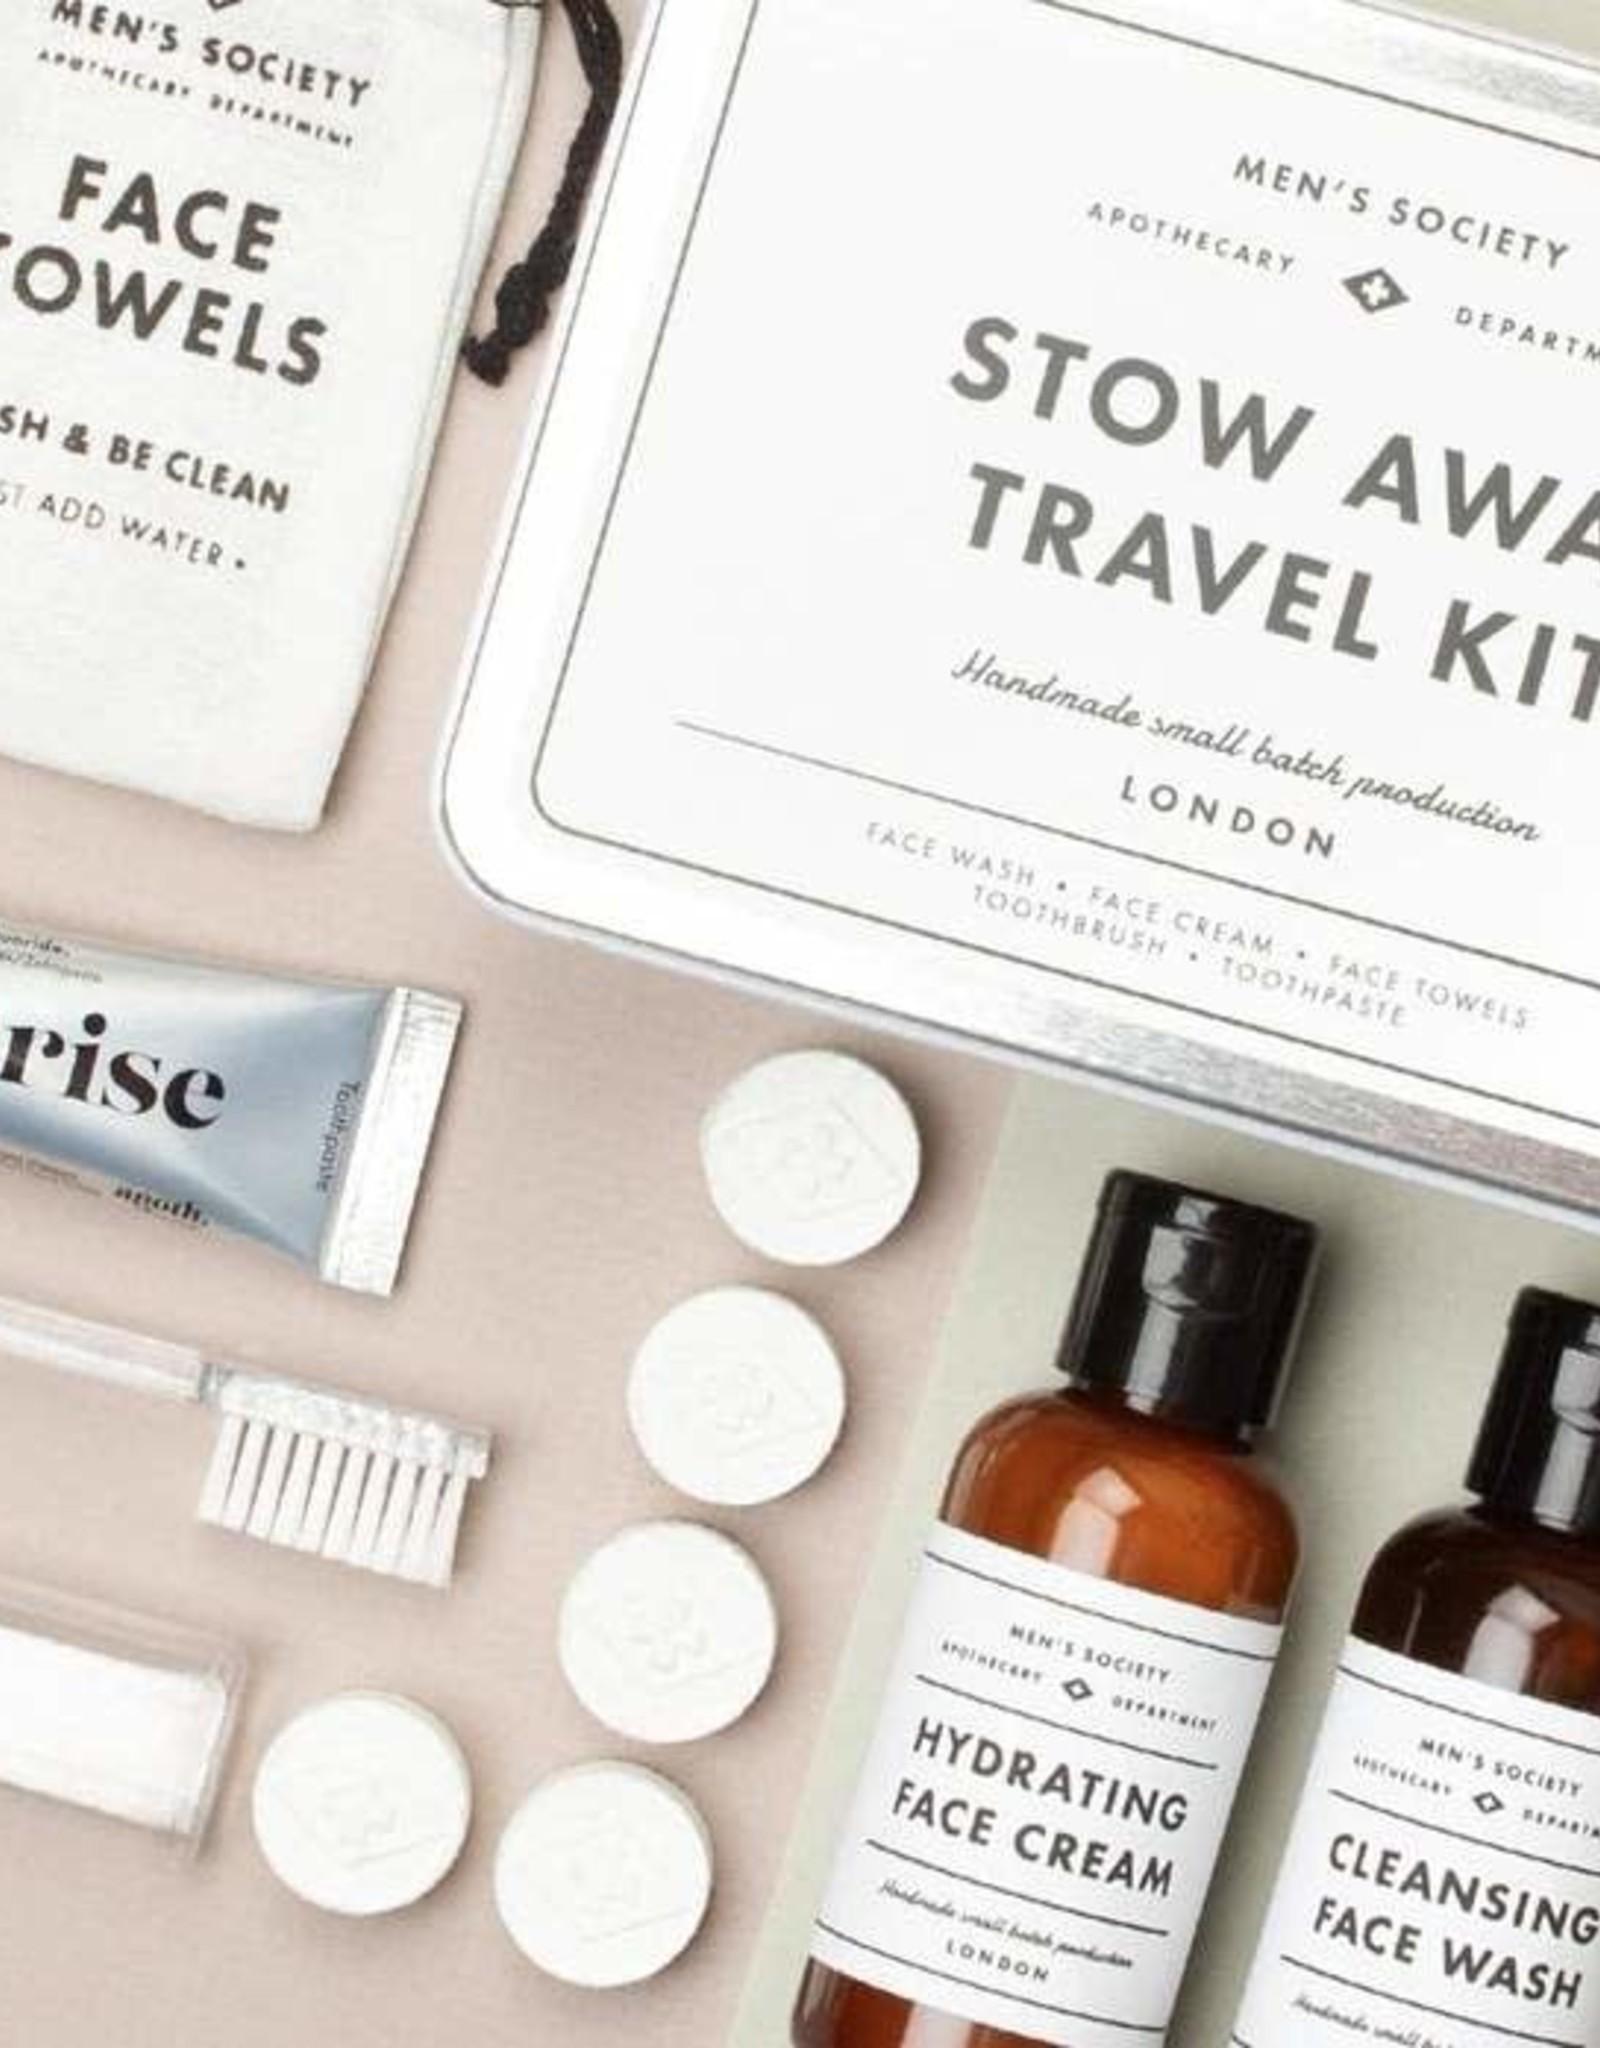 M-Soc Stow Away Travel Kit